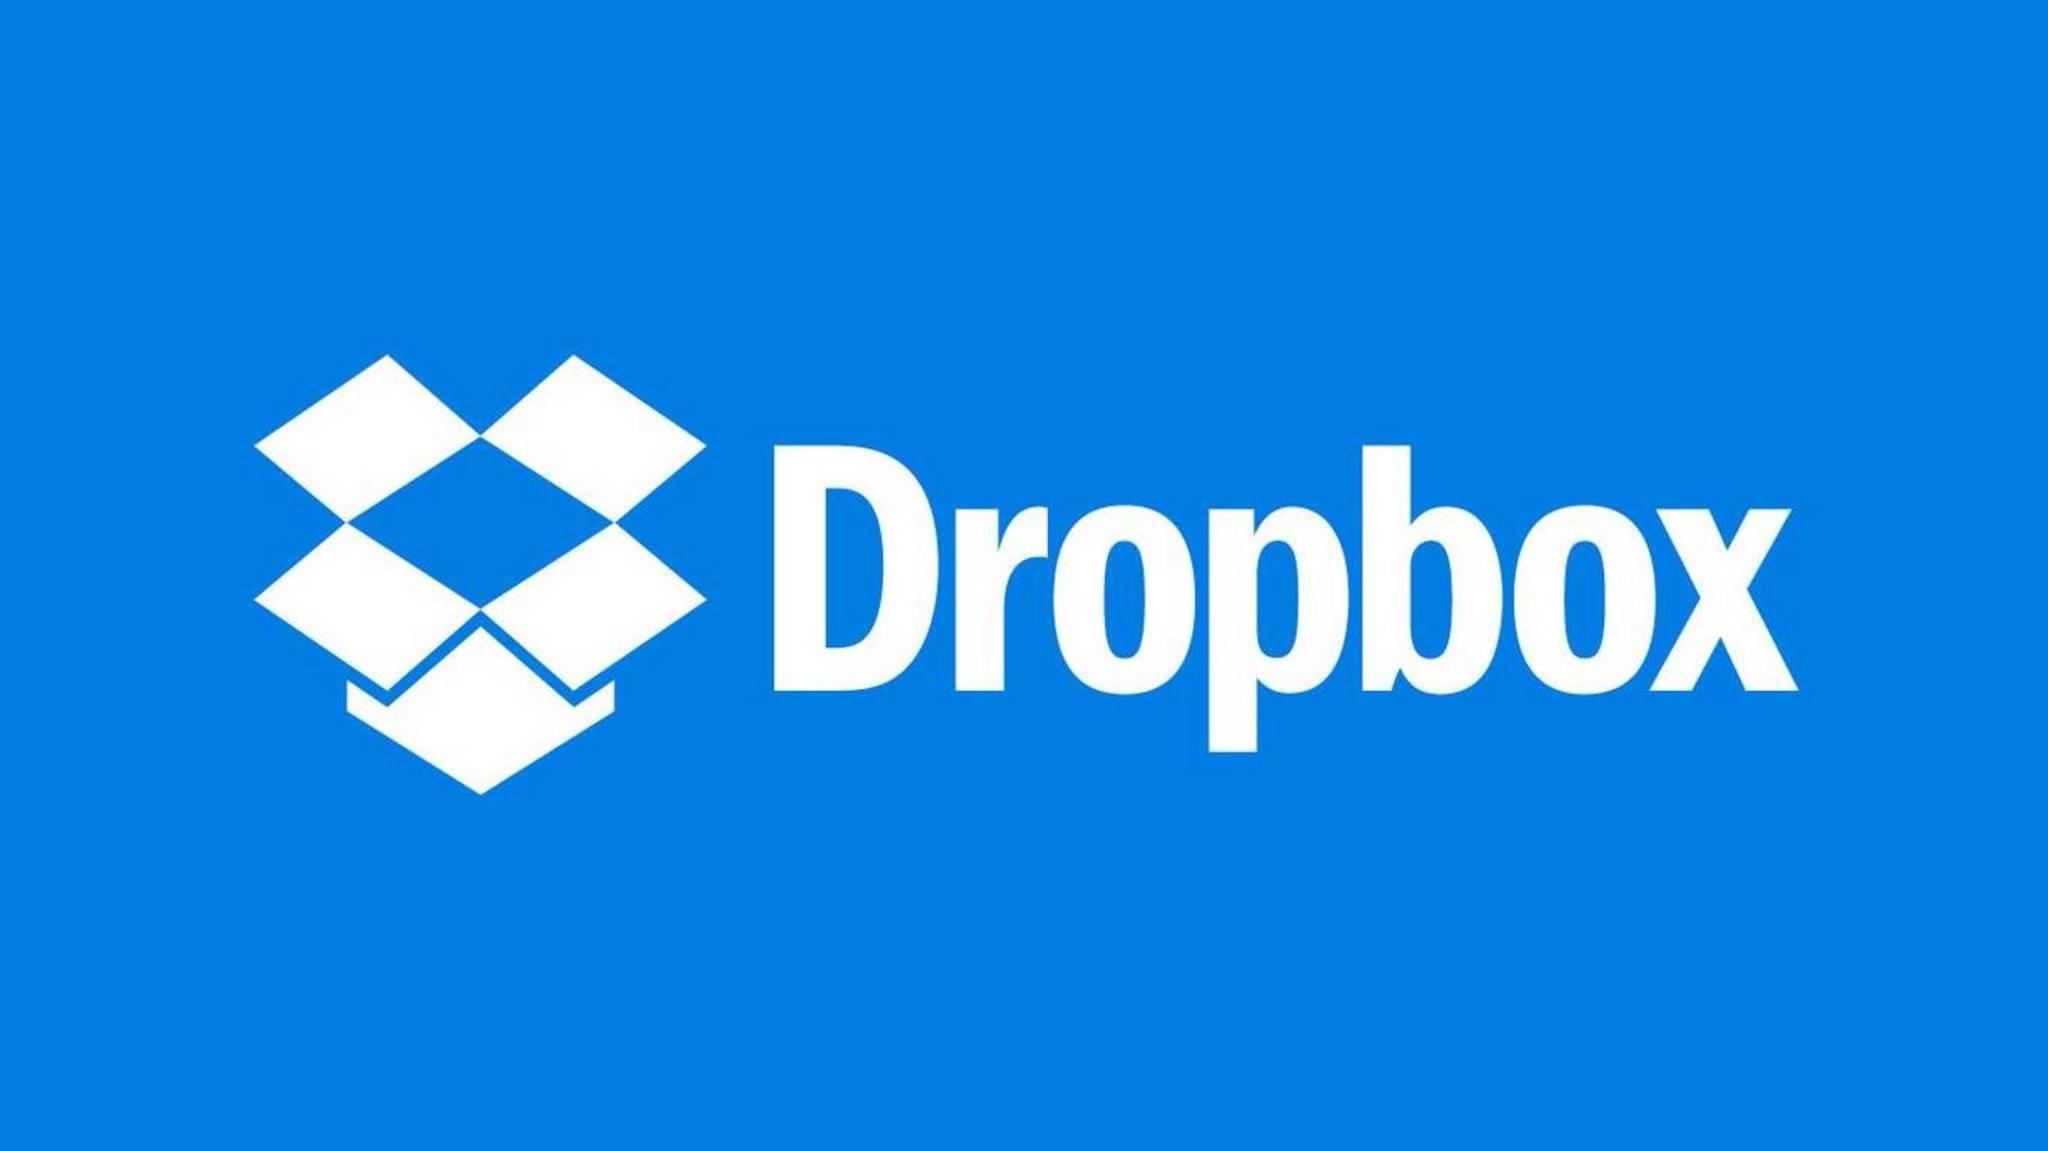 Dropbox Logo.JPG